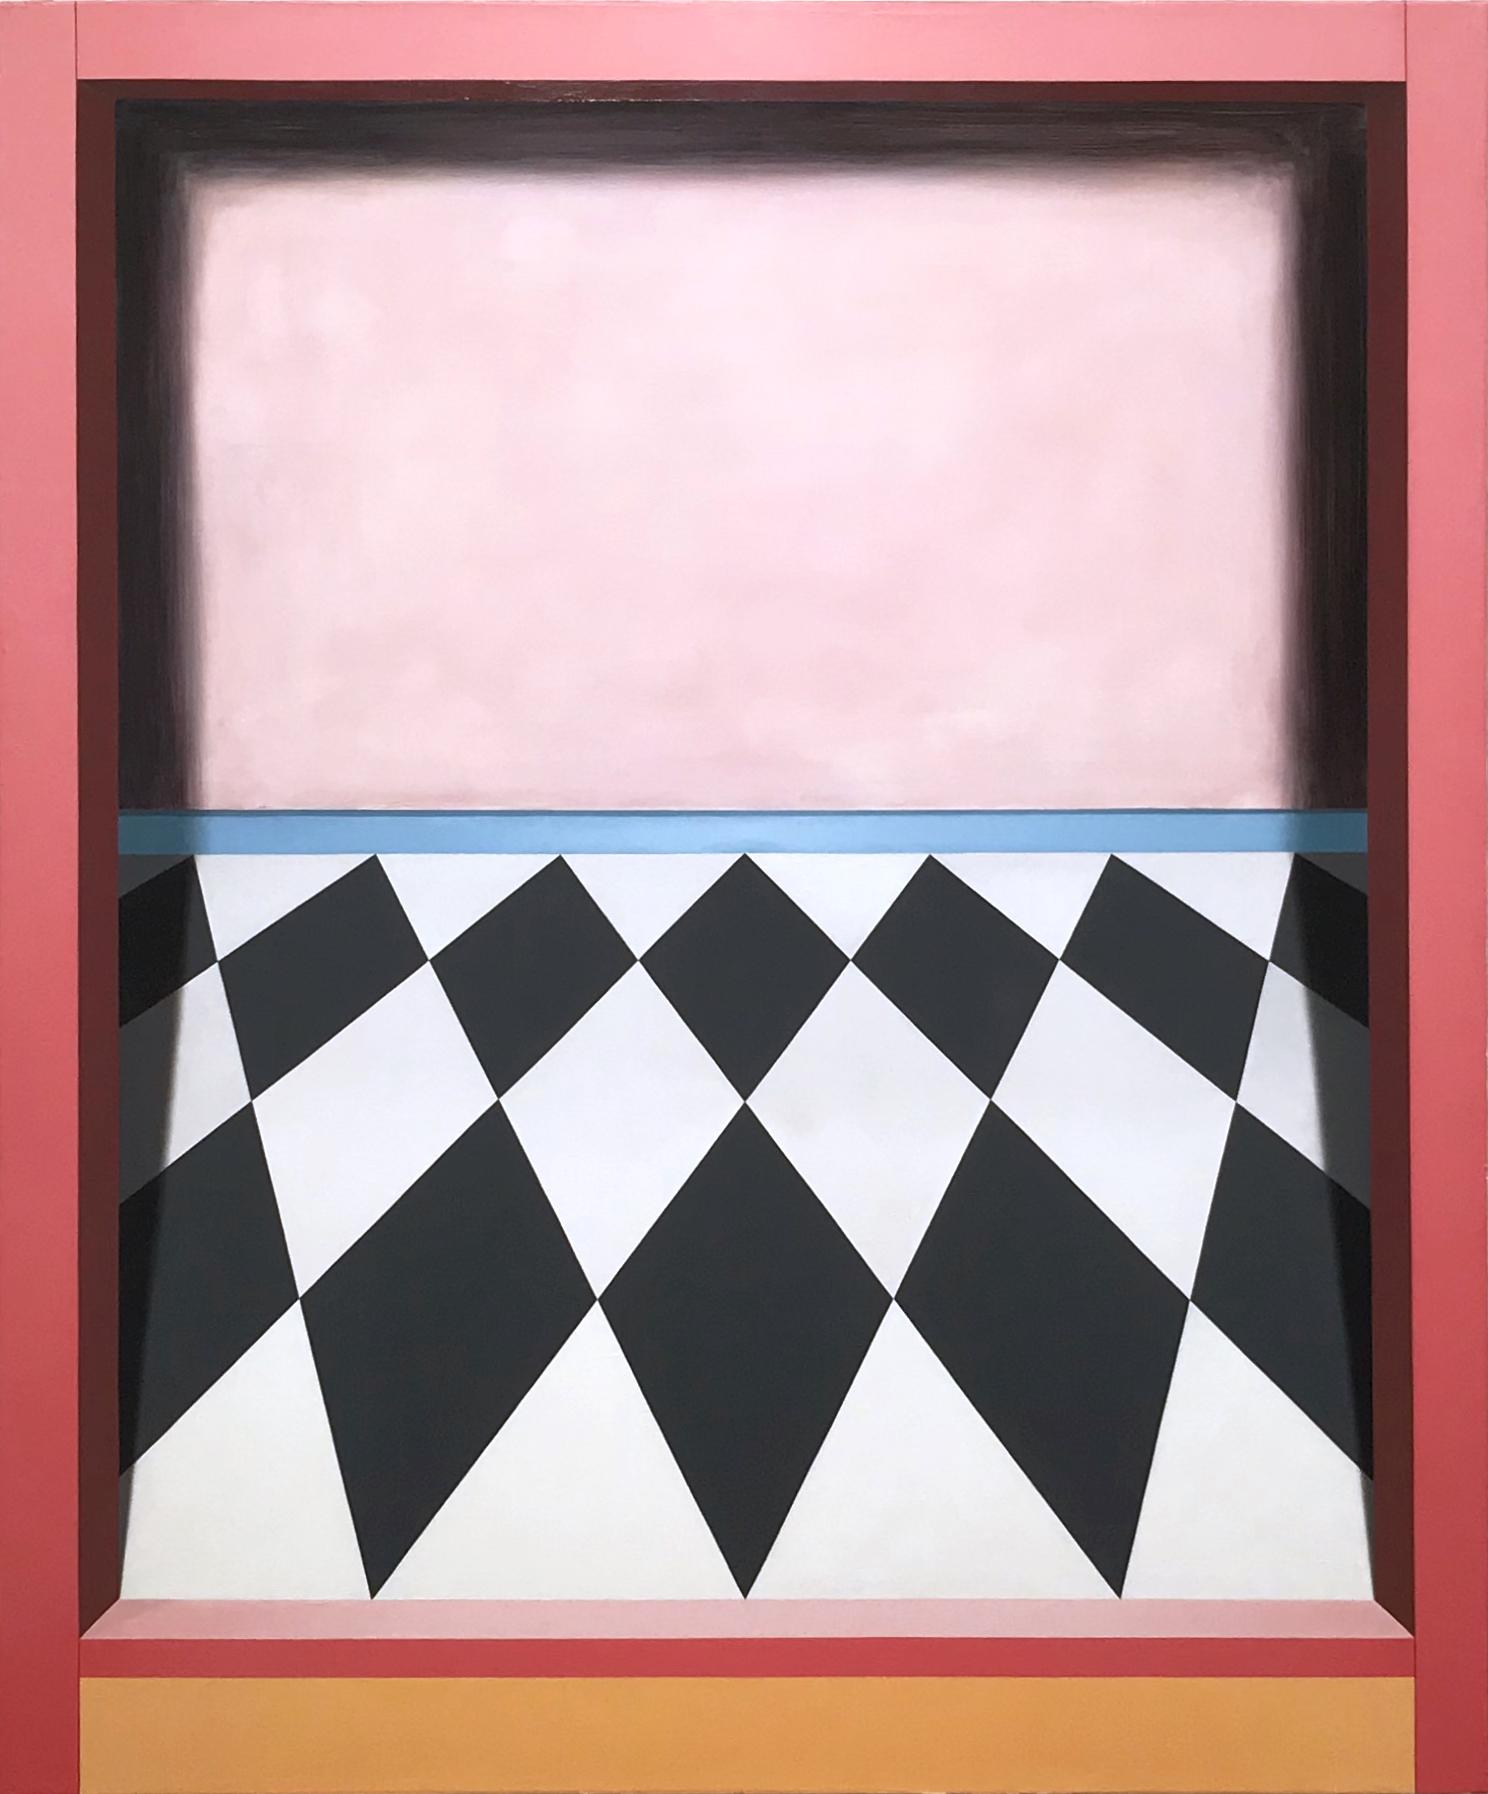 Threshold (Tilt)   2018  Oil on canvas  46 x 38 in